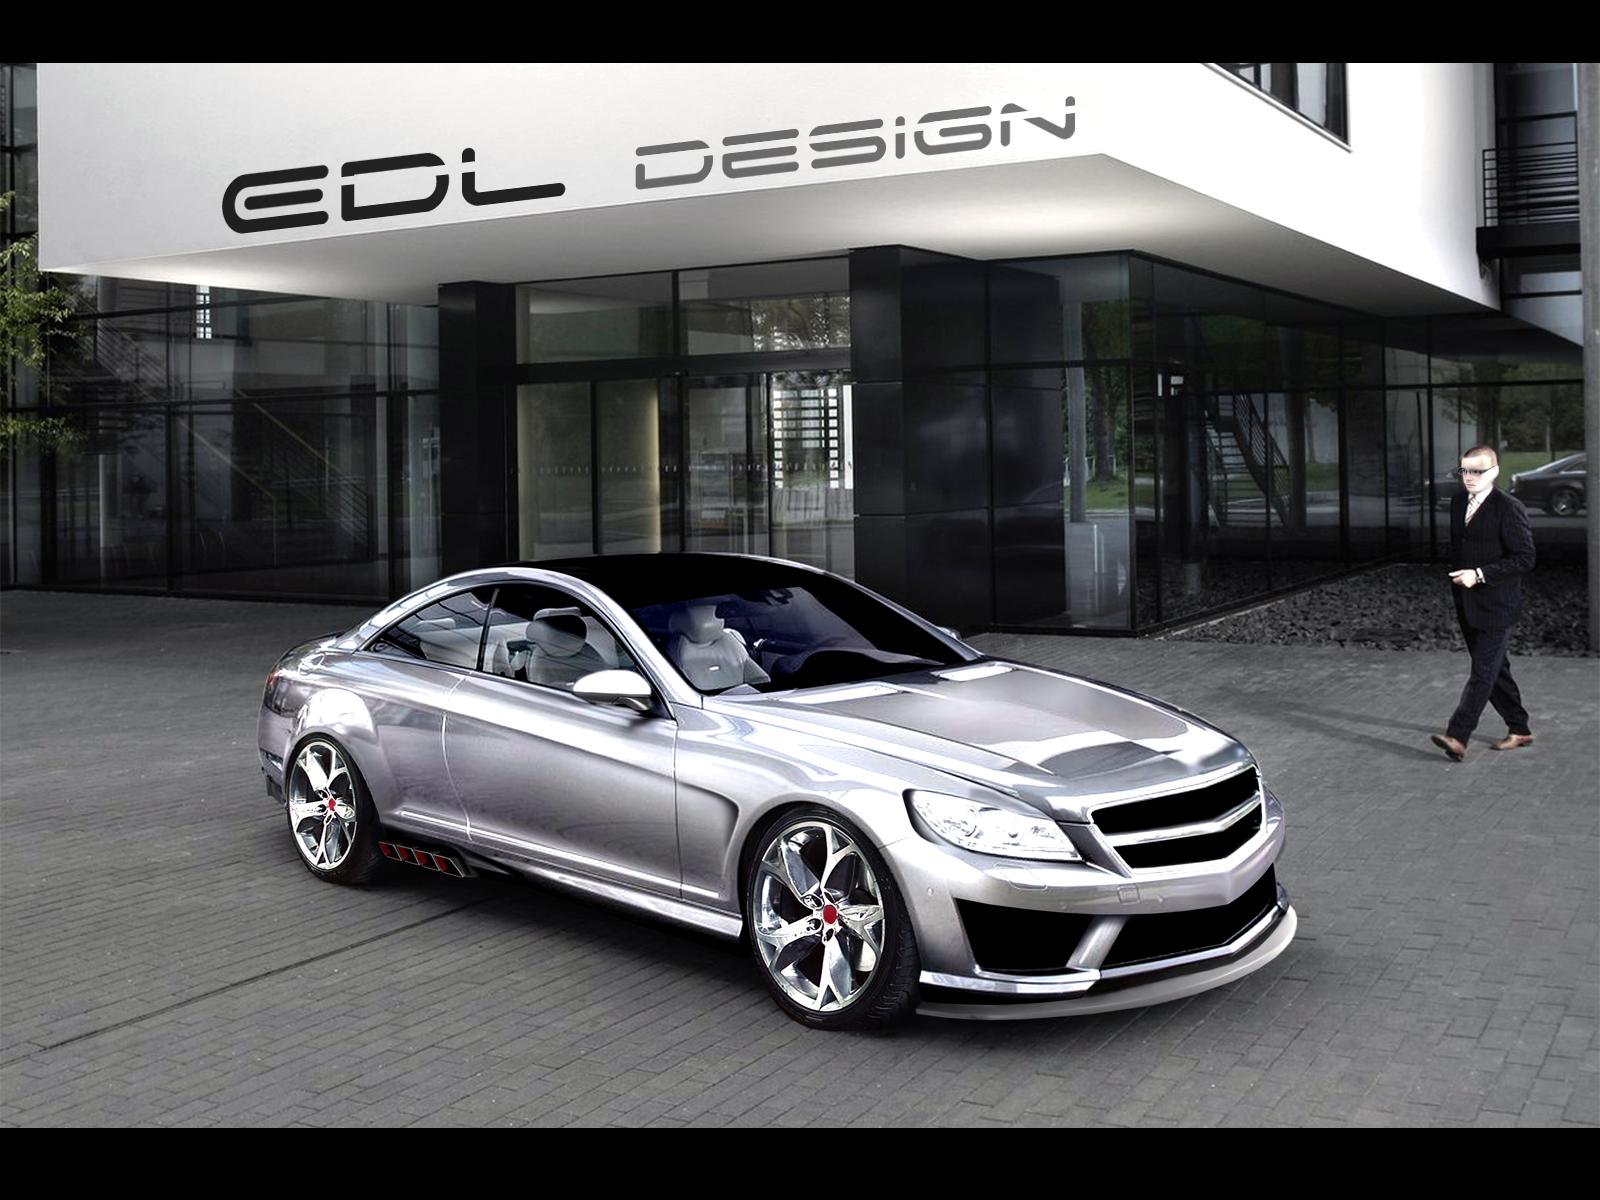 Chrome Mercedes-Benz CL63 AMG by EDLdesign on DeviantArt